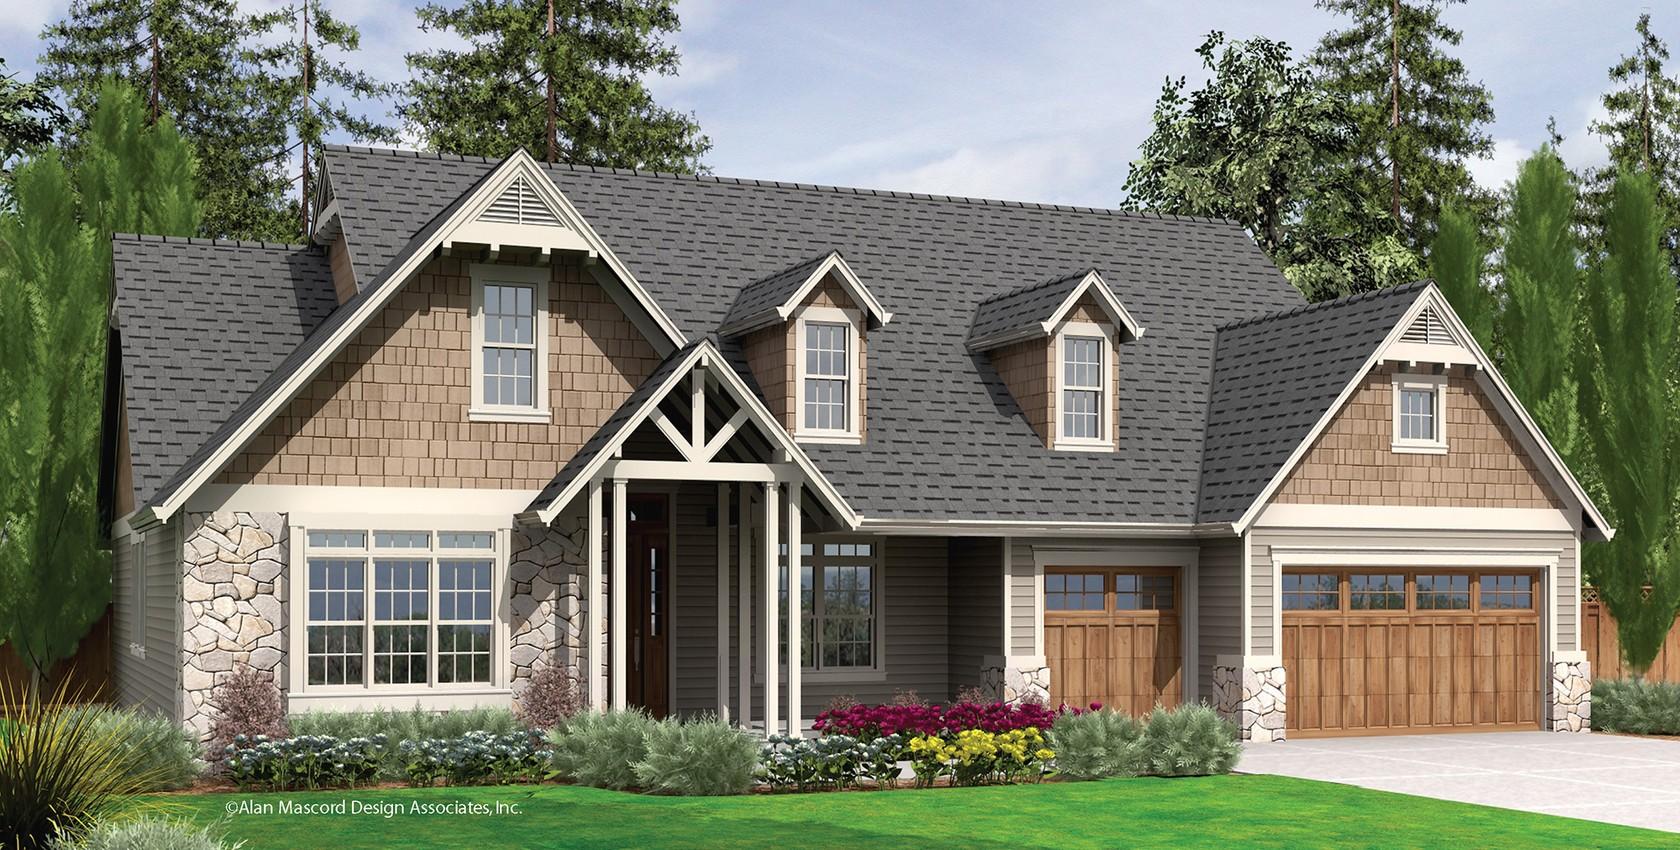 Mascord house plan 22157 the alton for House plans mascord